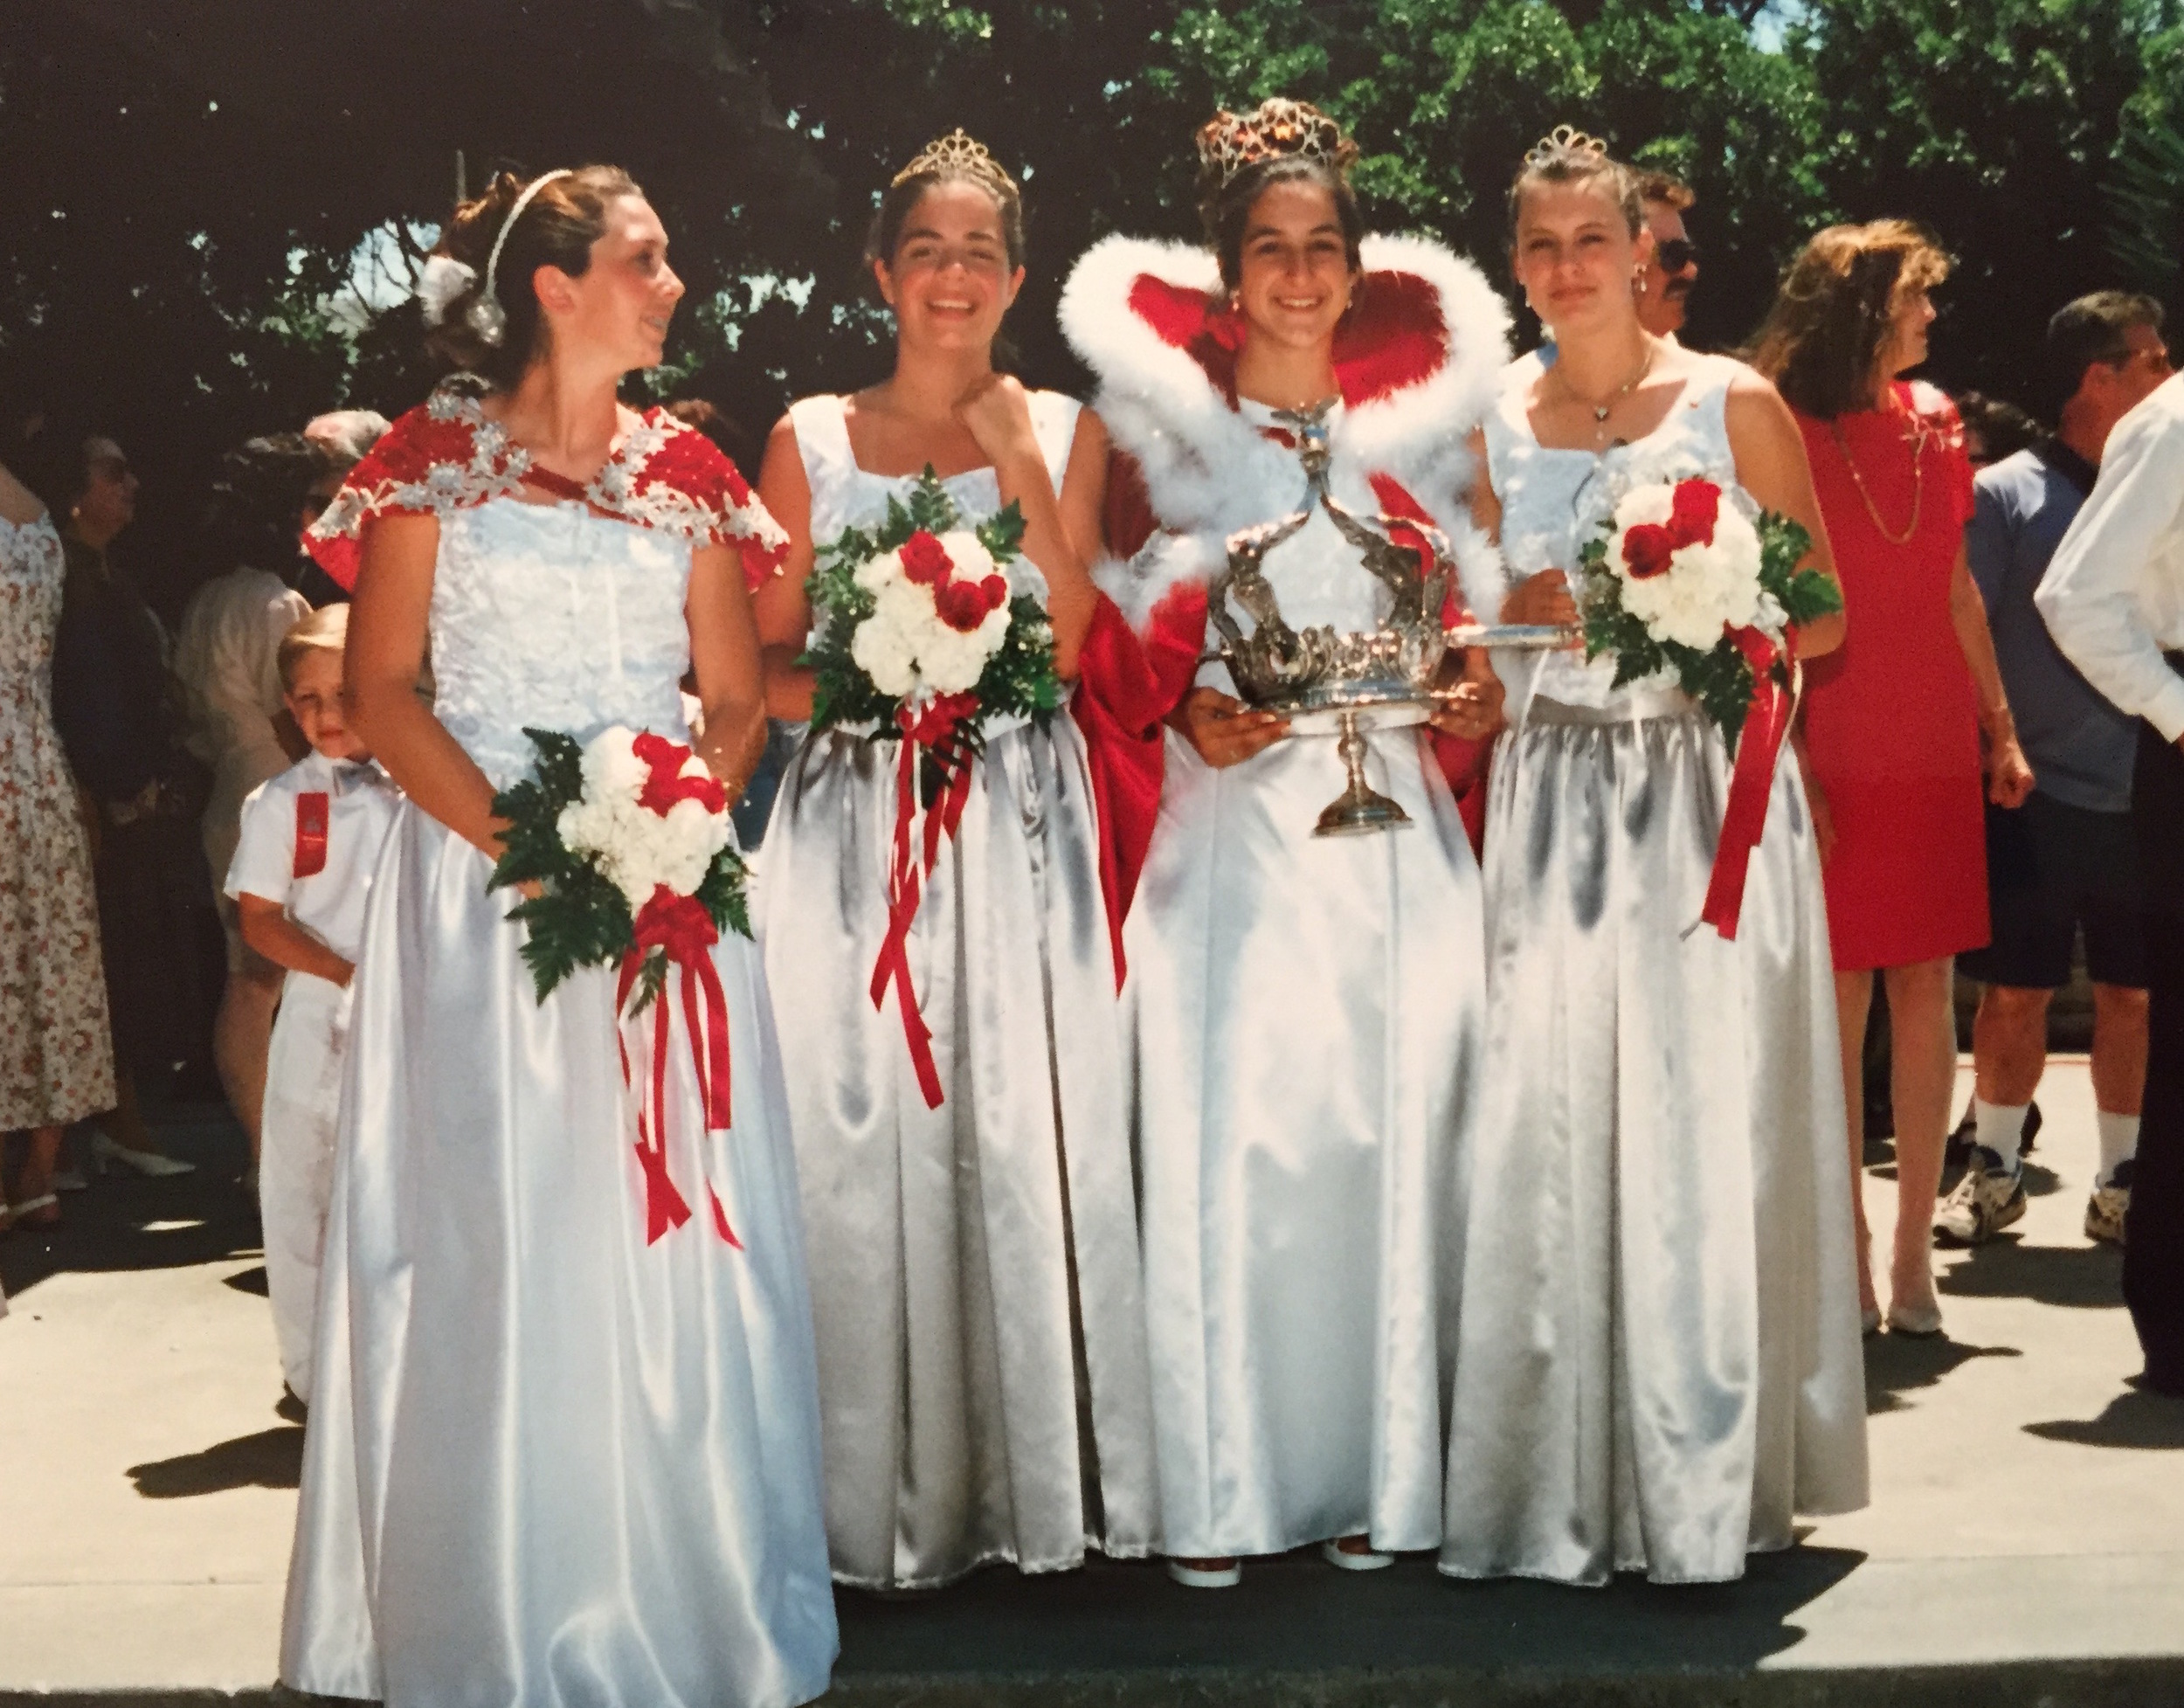 1997   Festival Queen - Amanda Monteiro - Lingle    Sidemaids - Jessica Marin & Kristen Rinetti